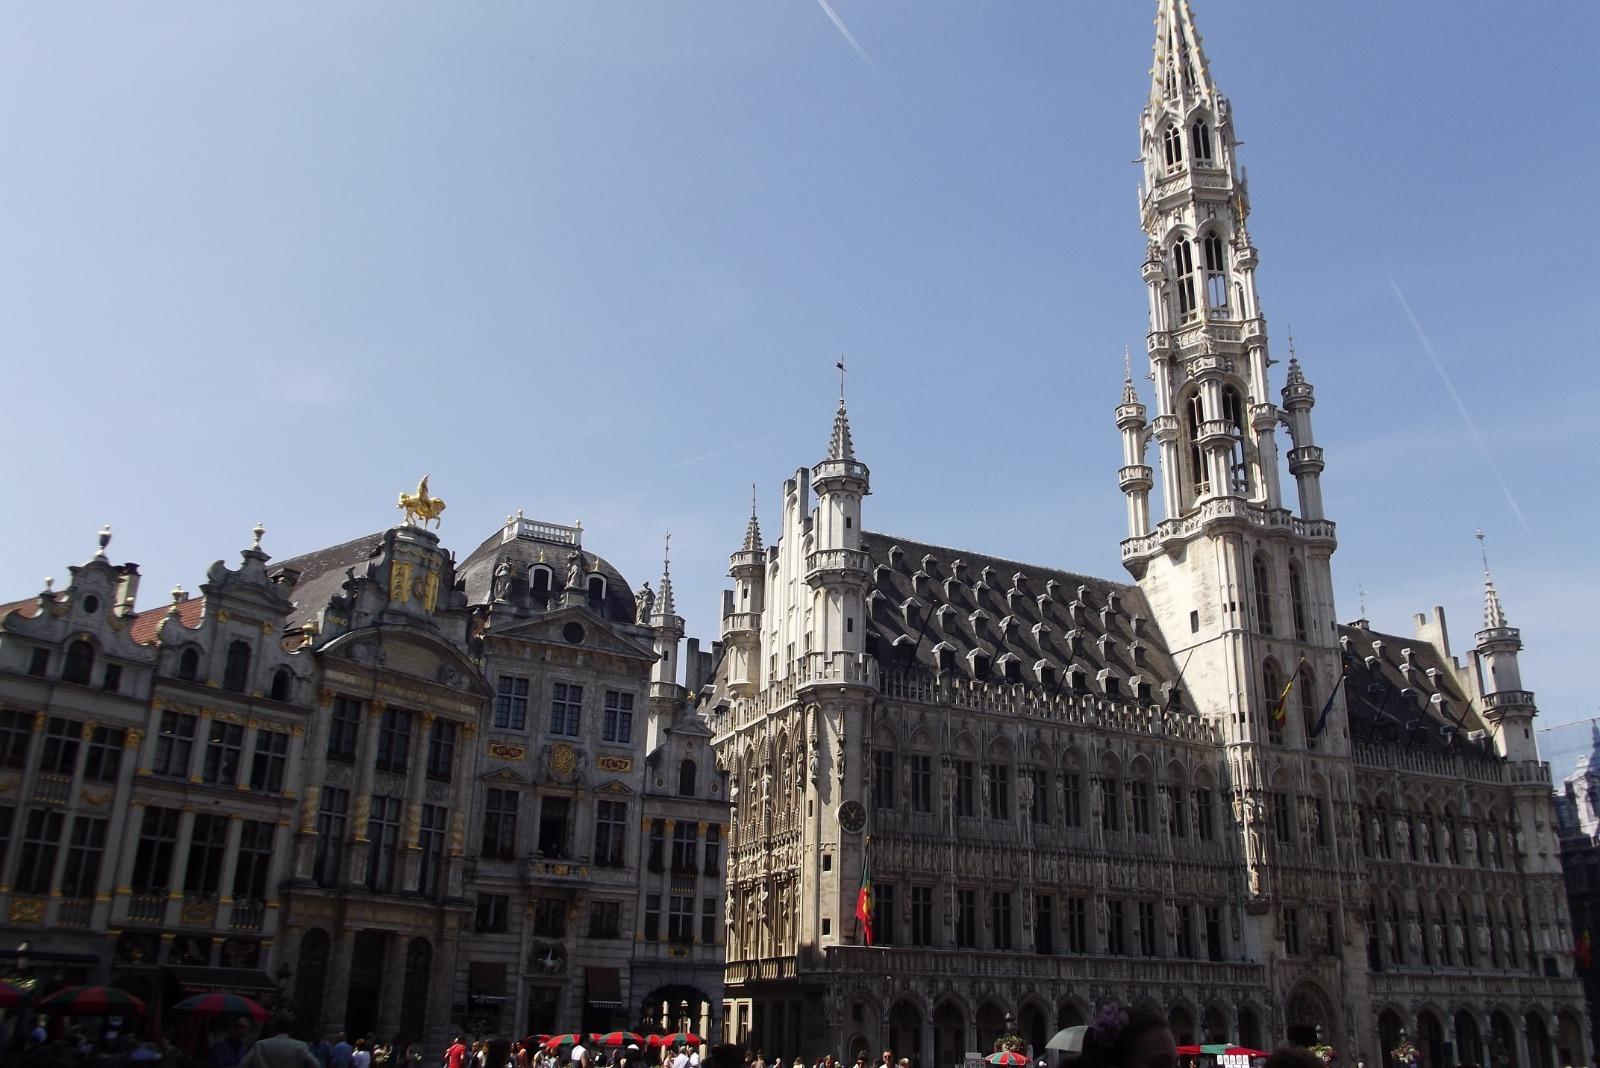 belgioelussemburgo10-1600418692.jpg